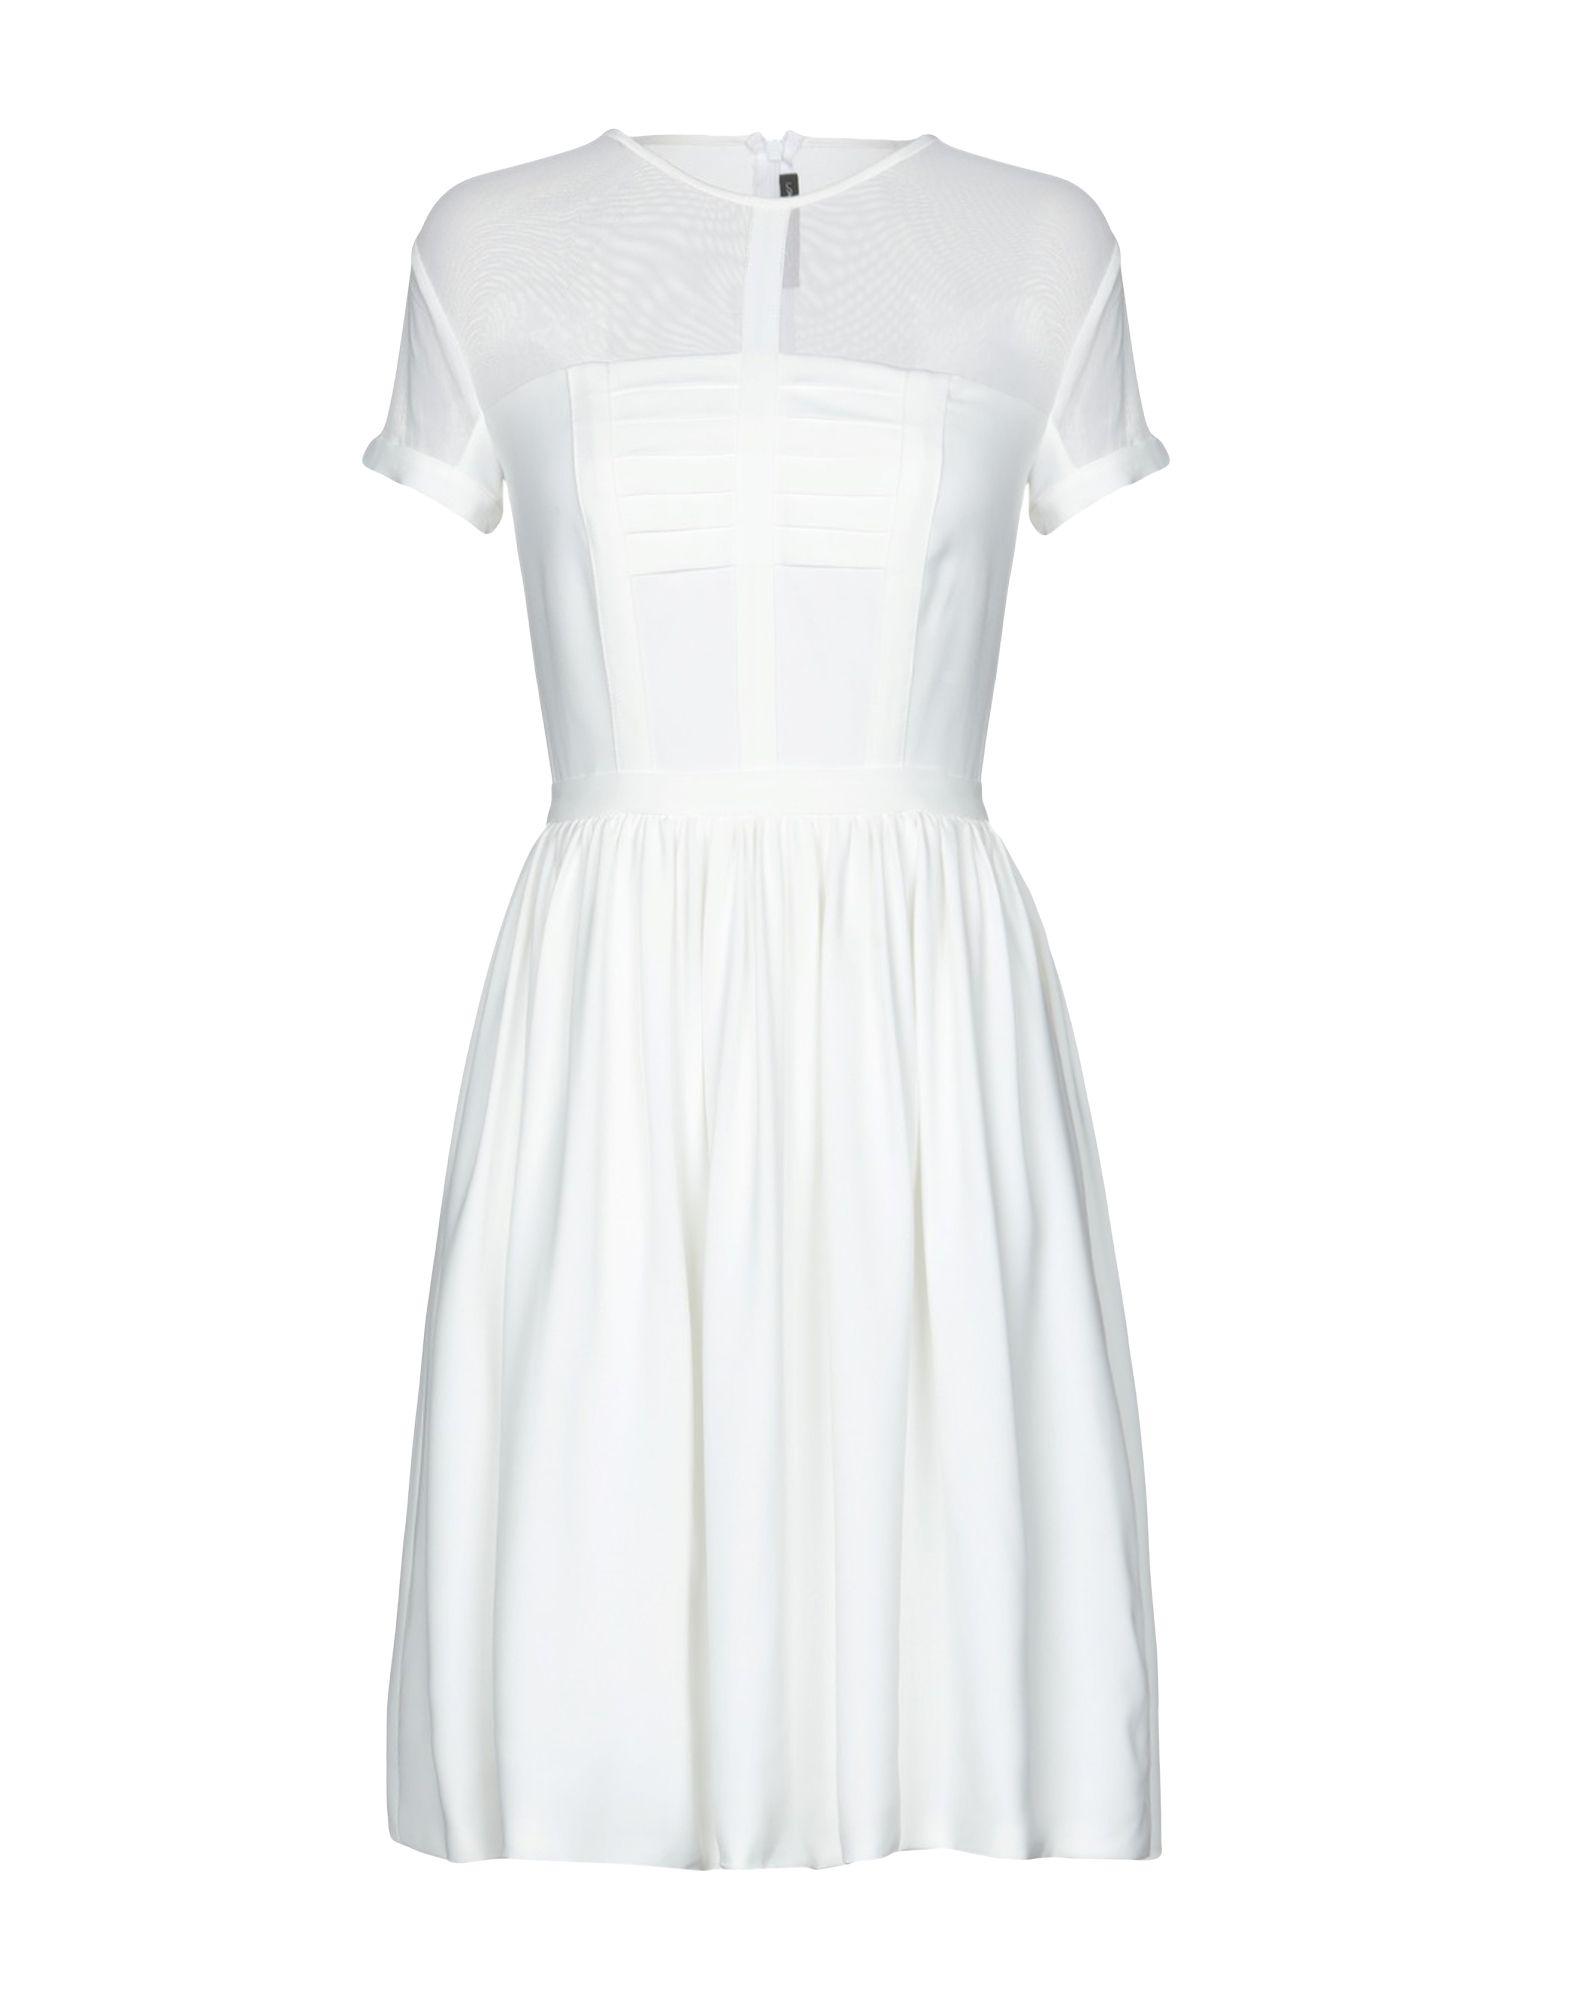 ISABEL GARCIA | ISABEL GARCIA Short dresses 34882702 | Goxip